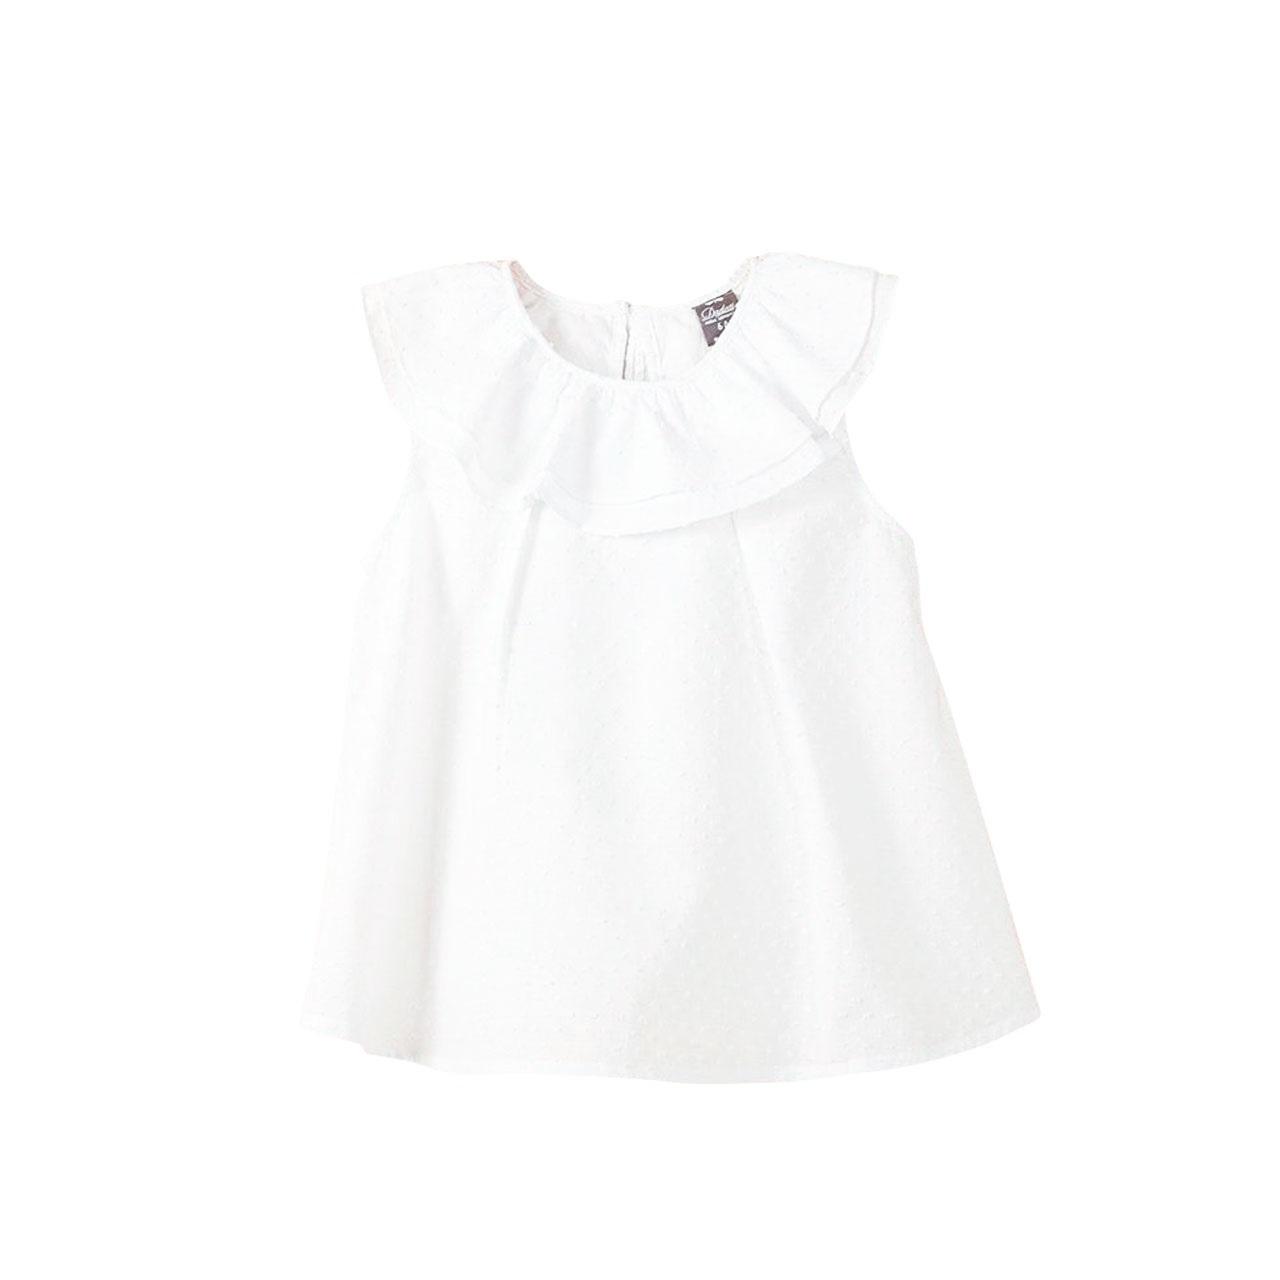 7c11dfe0a Blusa de bebé niña plumeti en blanco. Dadati - Moda infantil